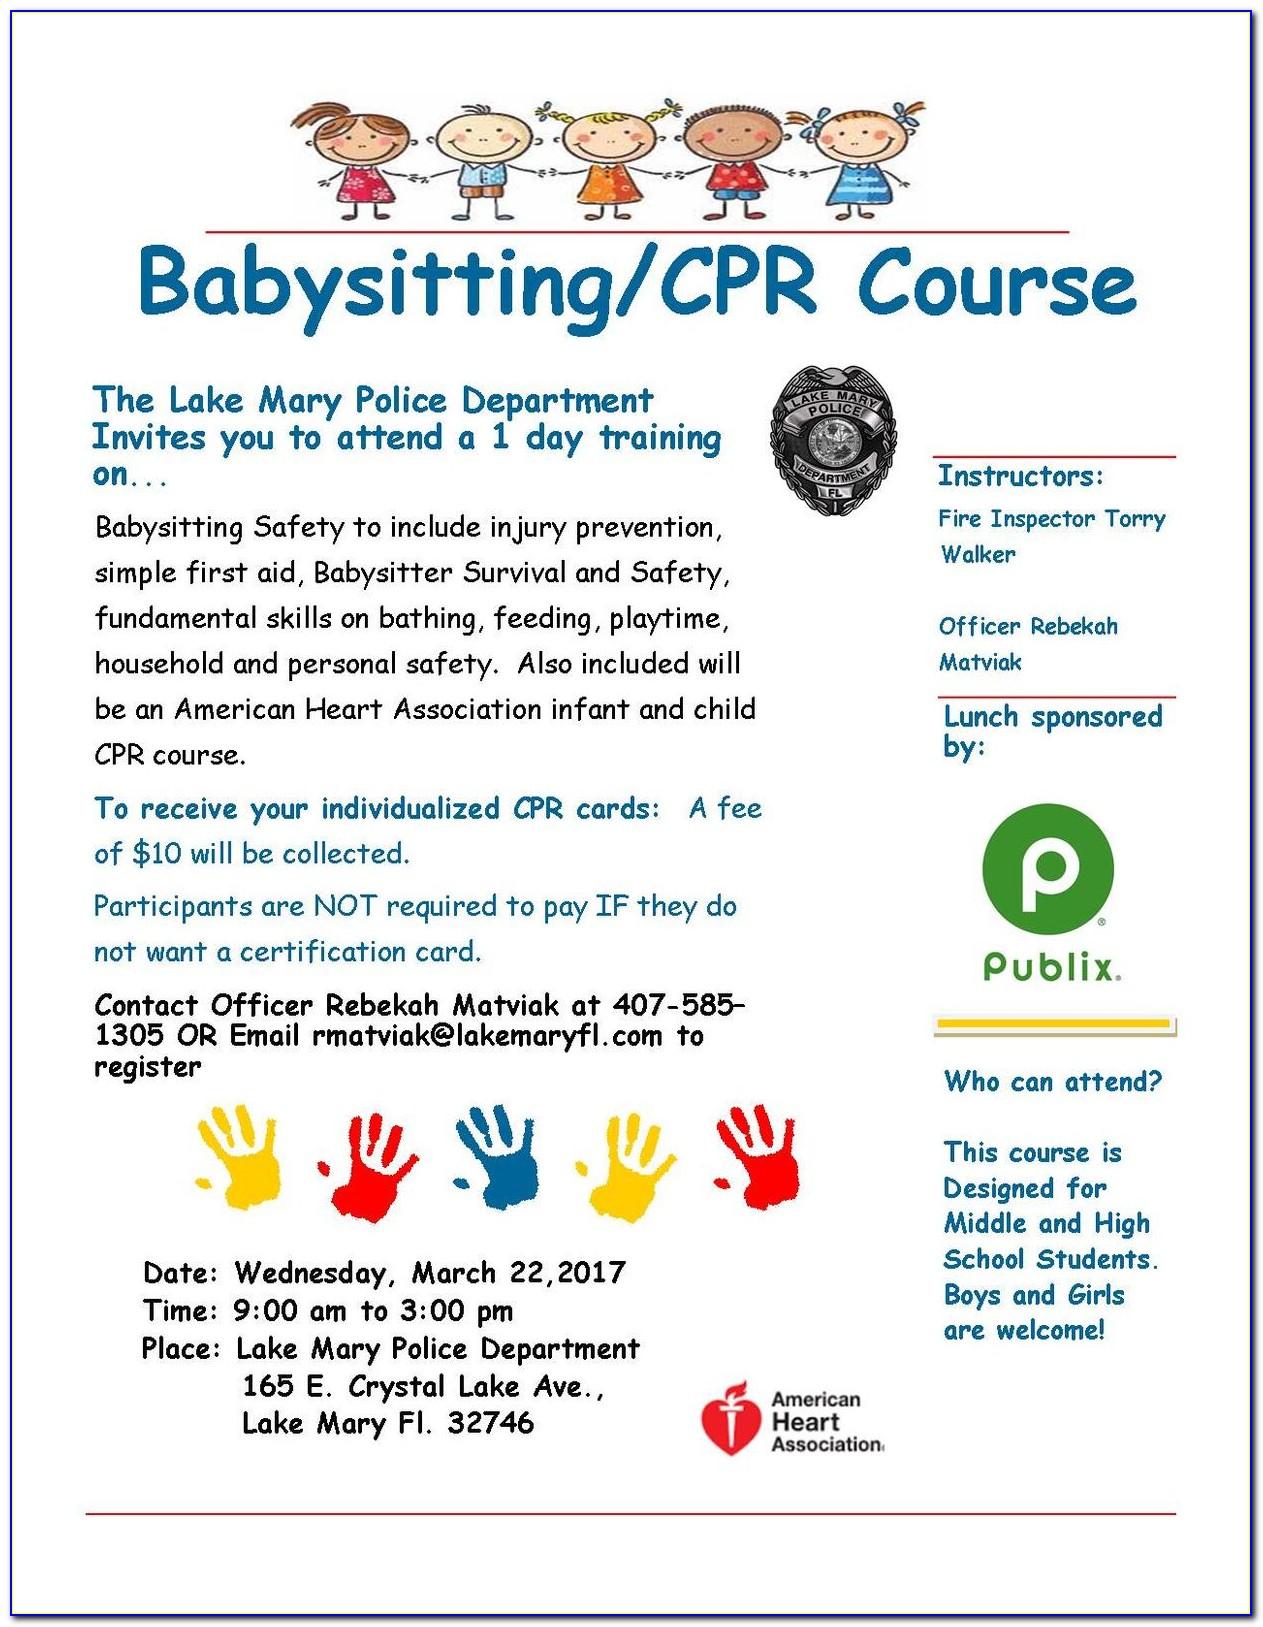 Free Babysitting Certification Classes